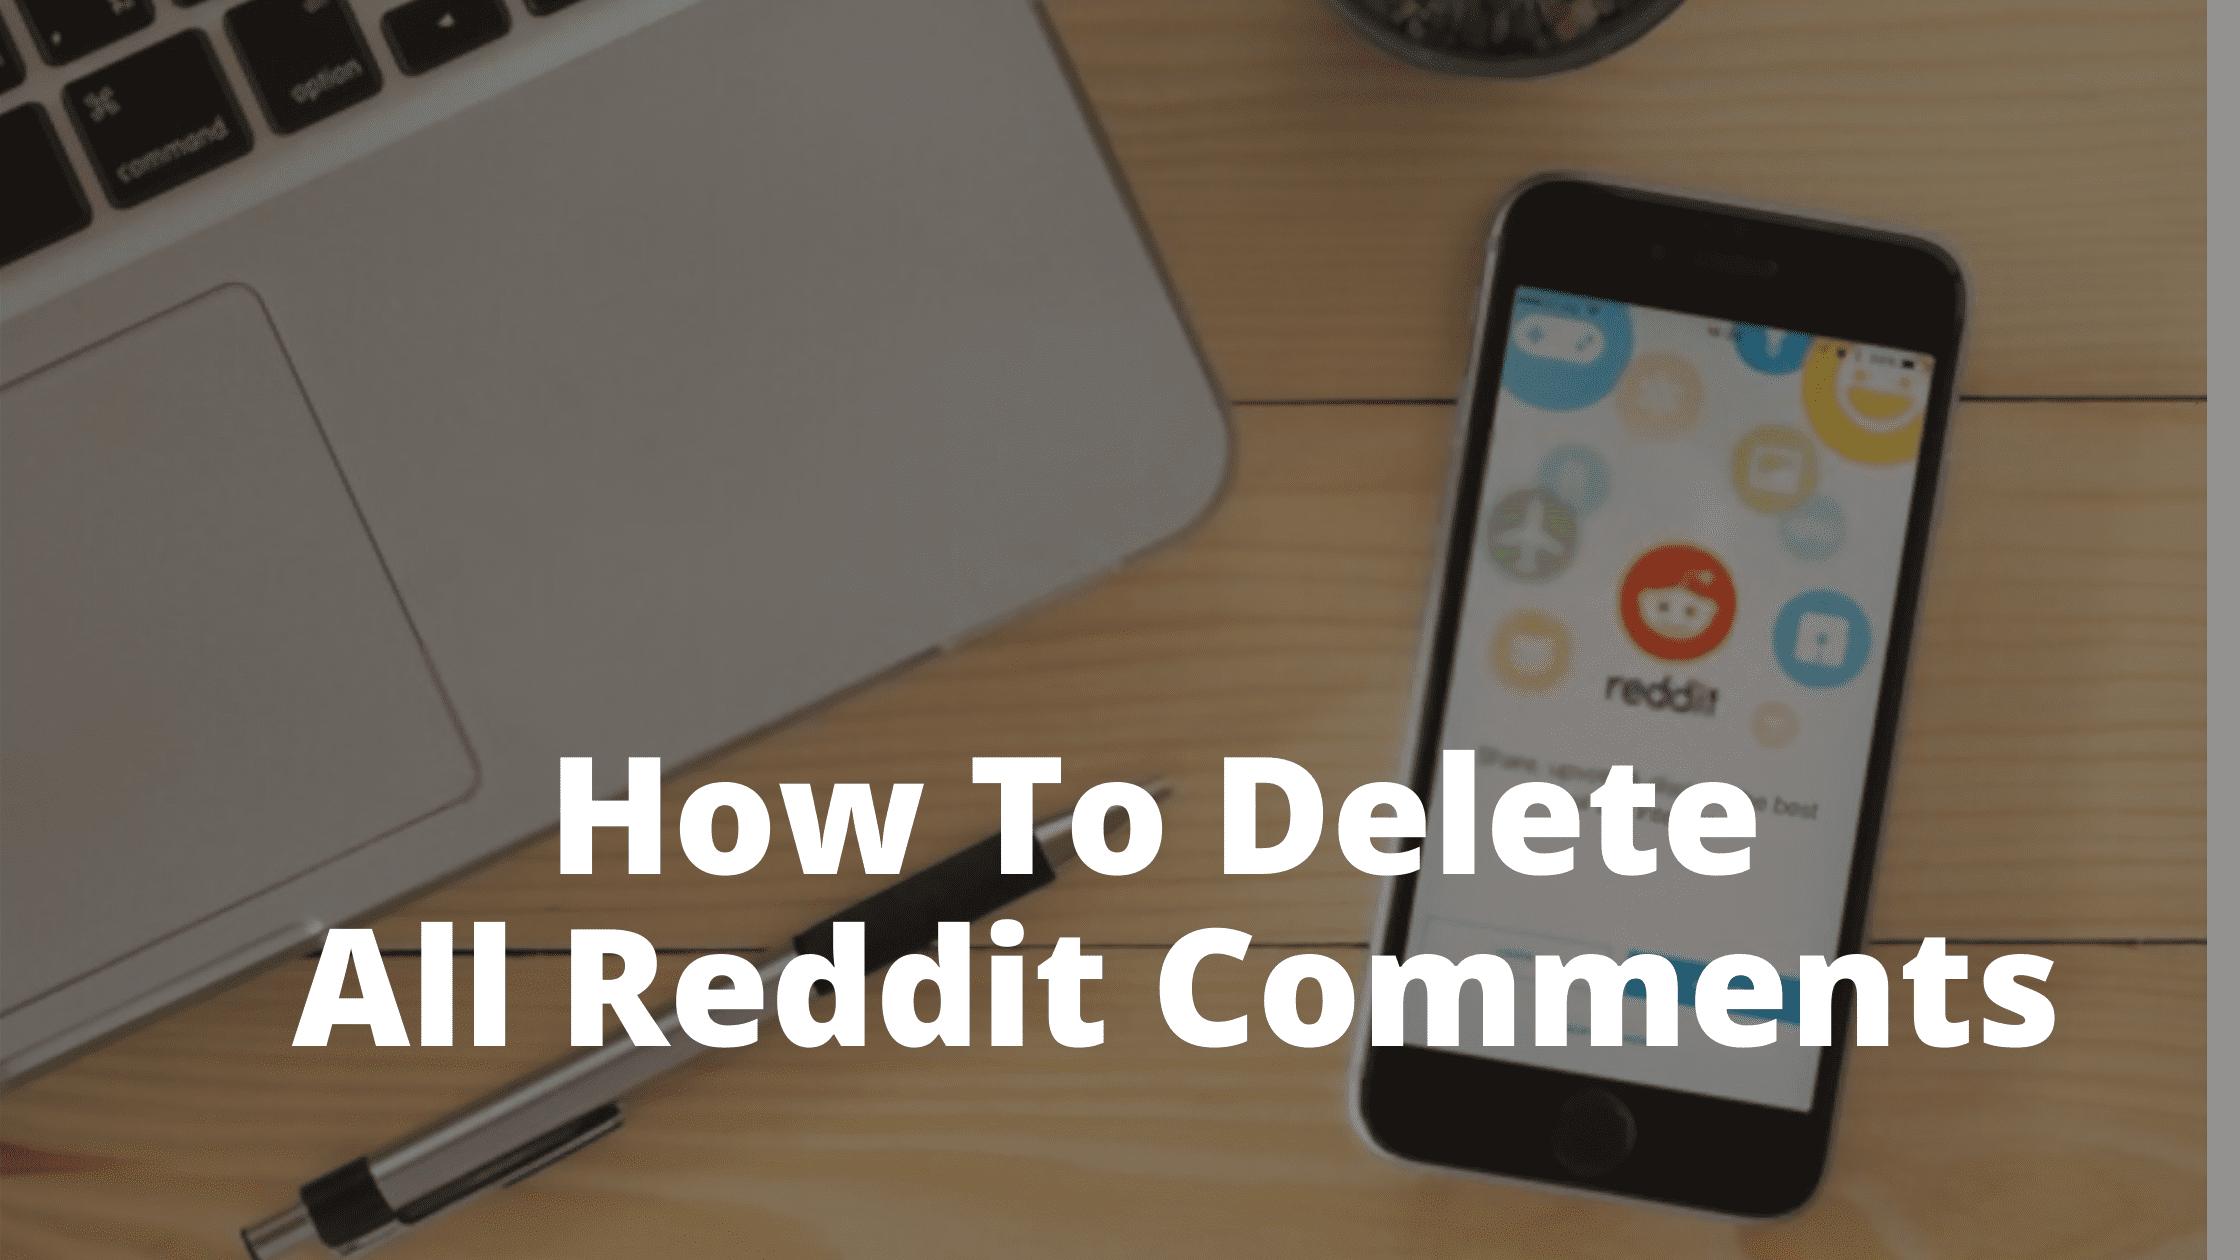 Delete All Reddit Comments